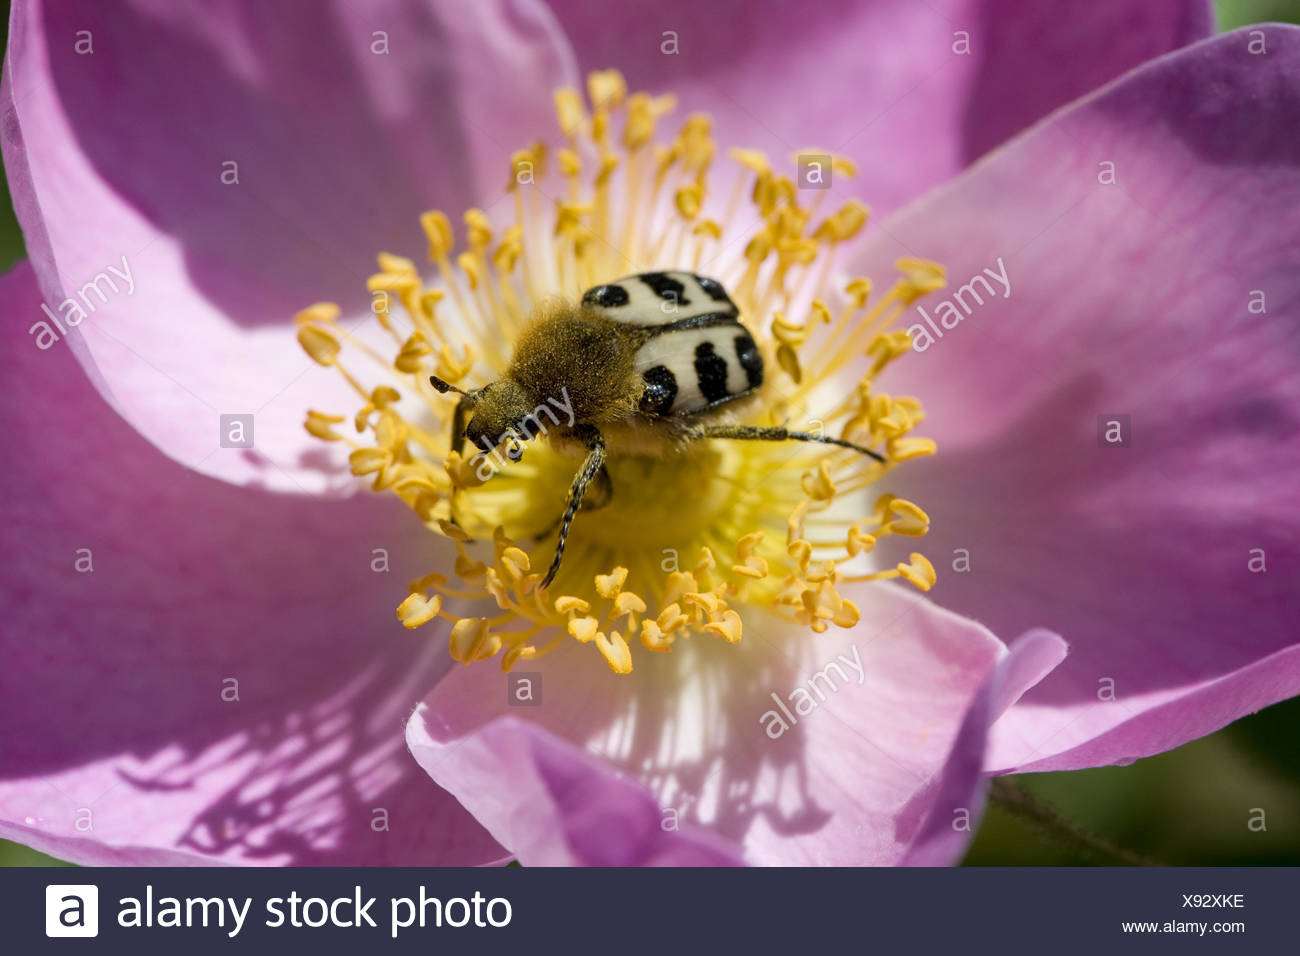 bee beetle (trichius fasciatus) on gallic rose (rosa gallica) - Stock Image